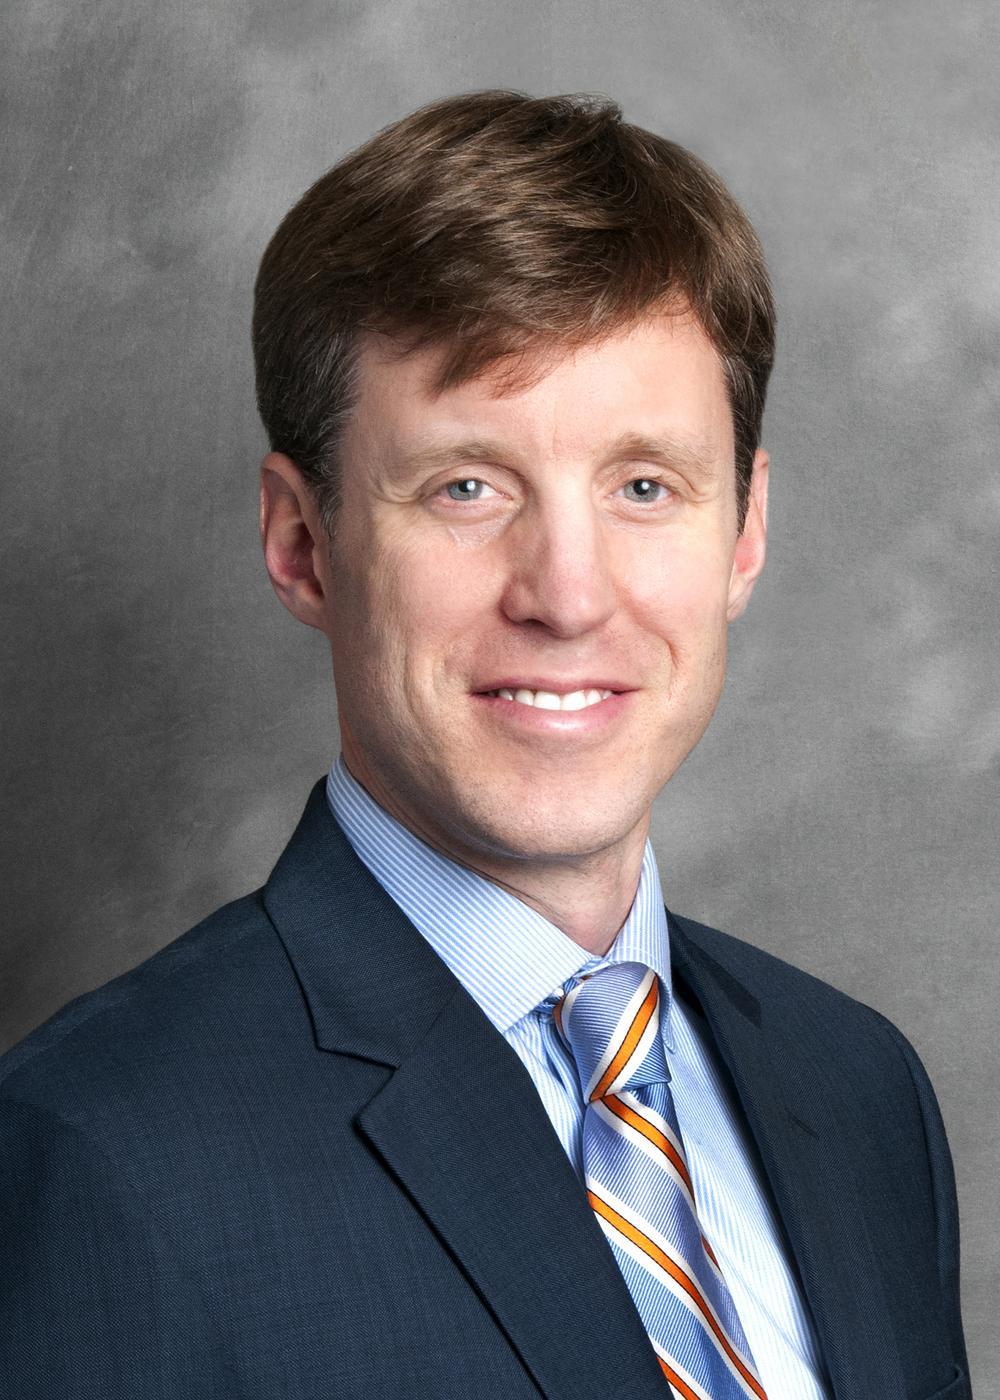 Scott T. Clanton, MS, CFP® Photo